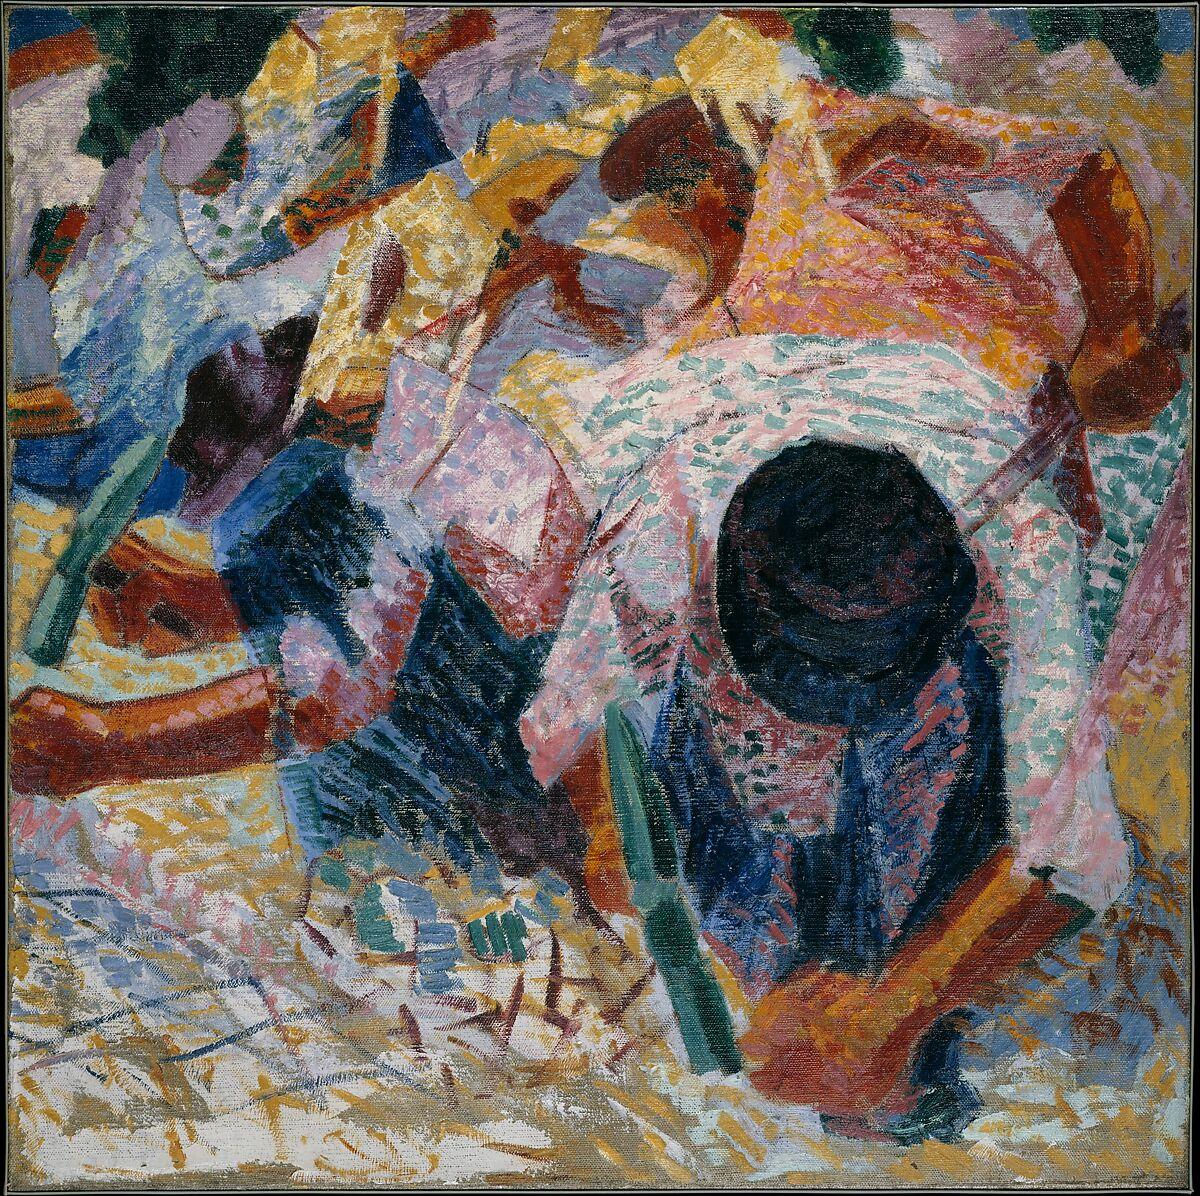 Umberto Boccioni 1882 1916 Essay The Metropolitan Museum Of Art Heilbrunn Timeline Of Art History